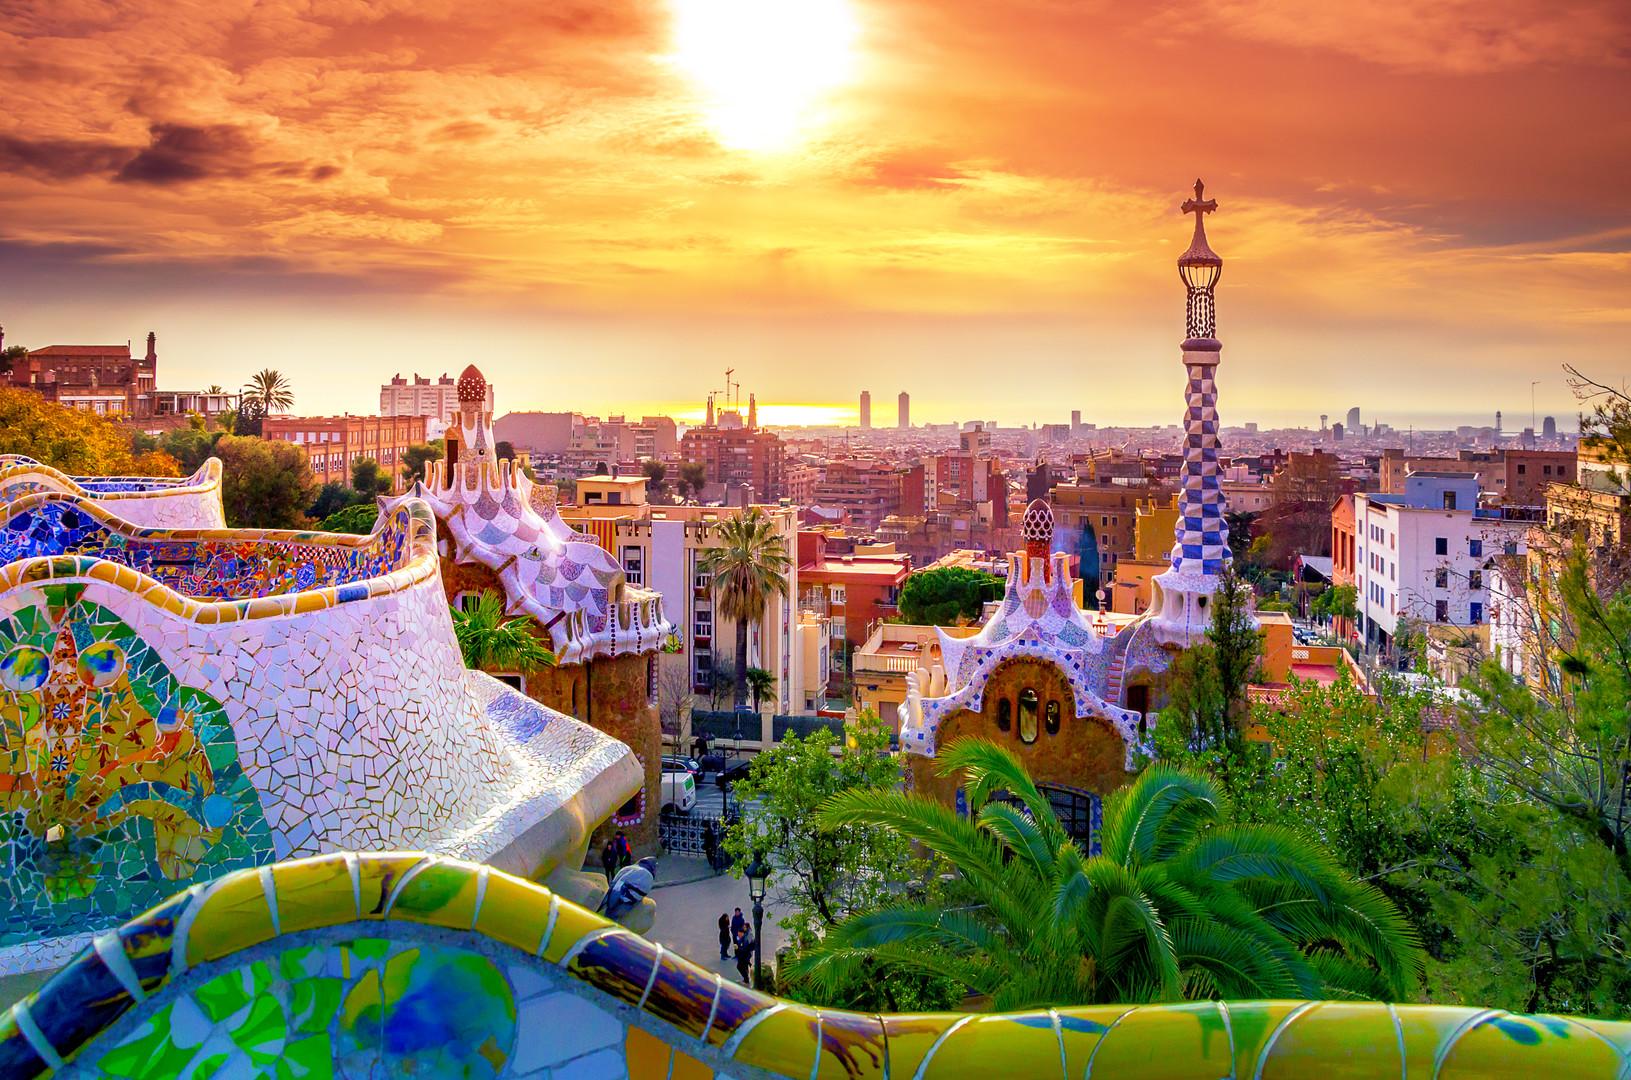 Krásy Katalánska s pobytem u moře #5